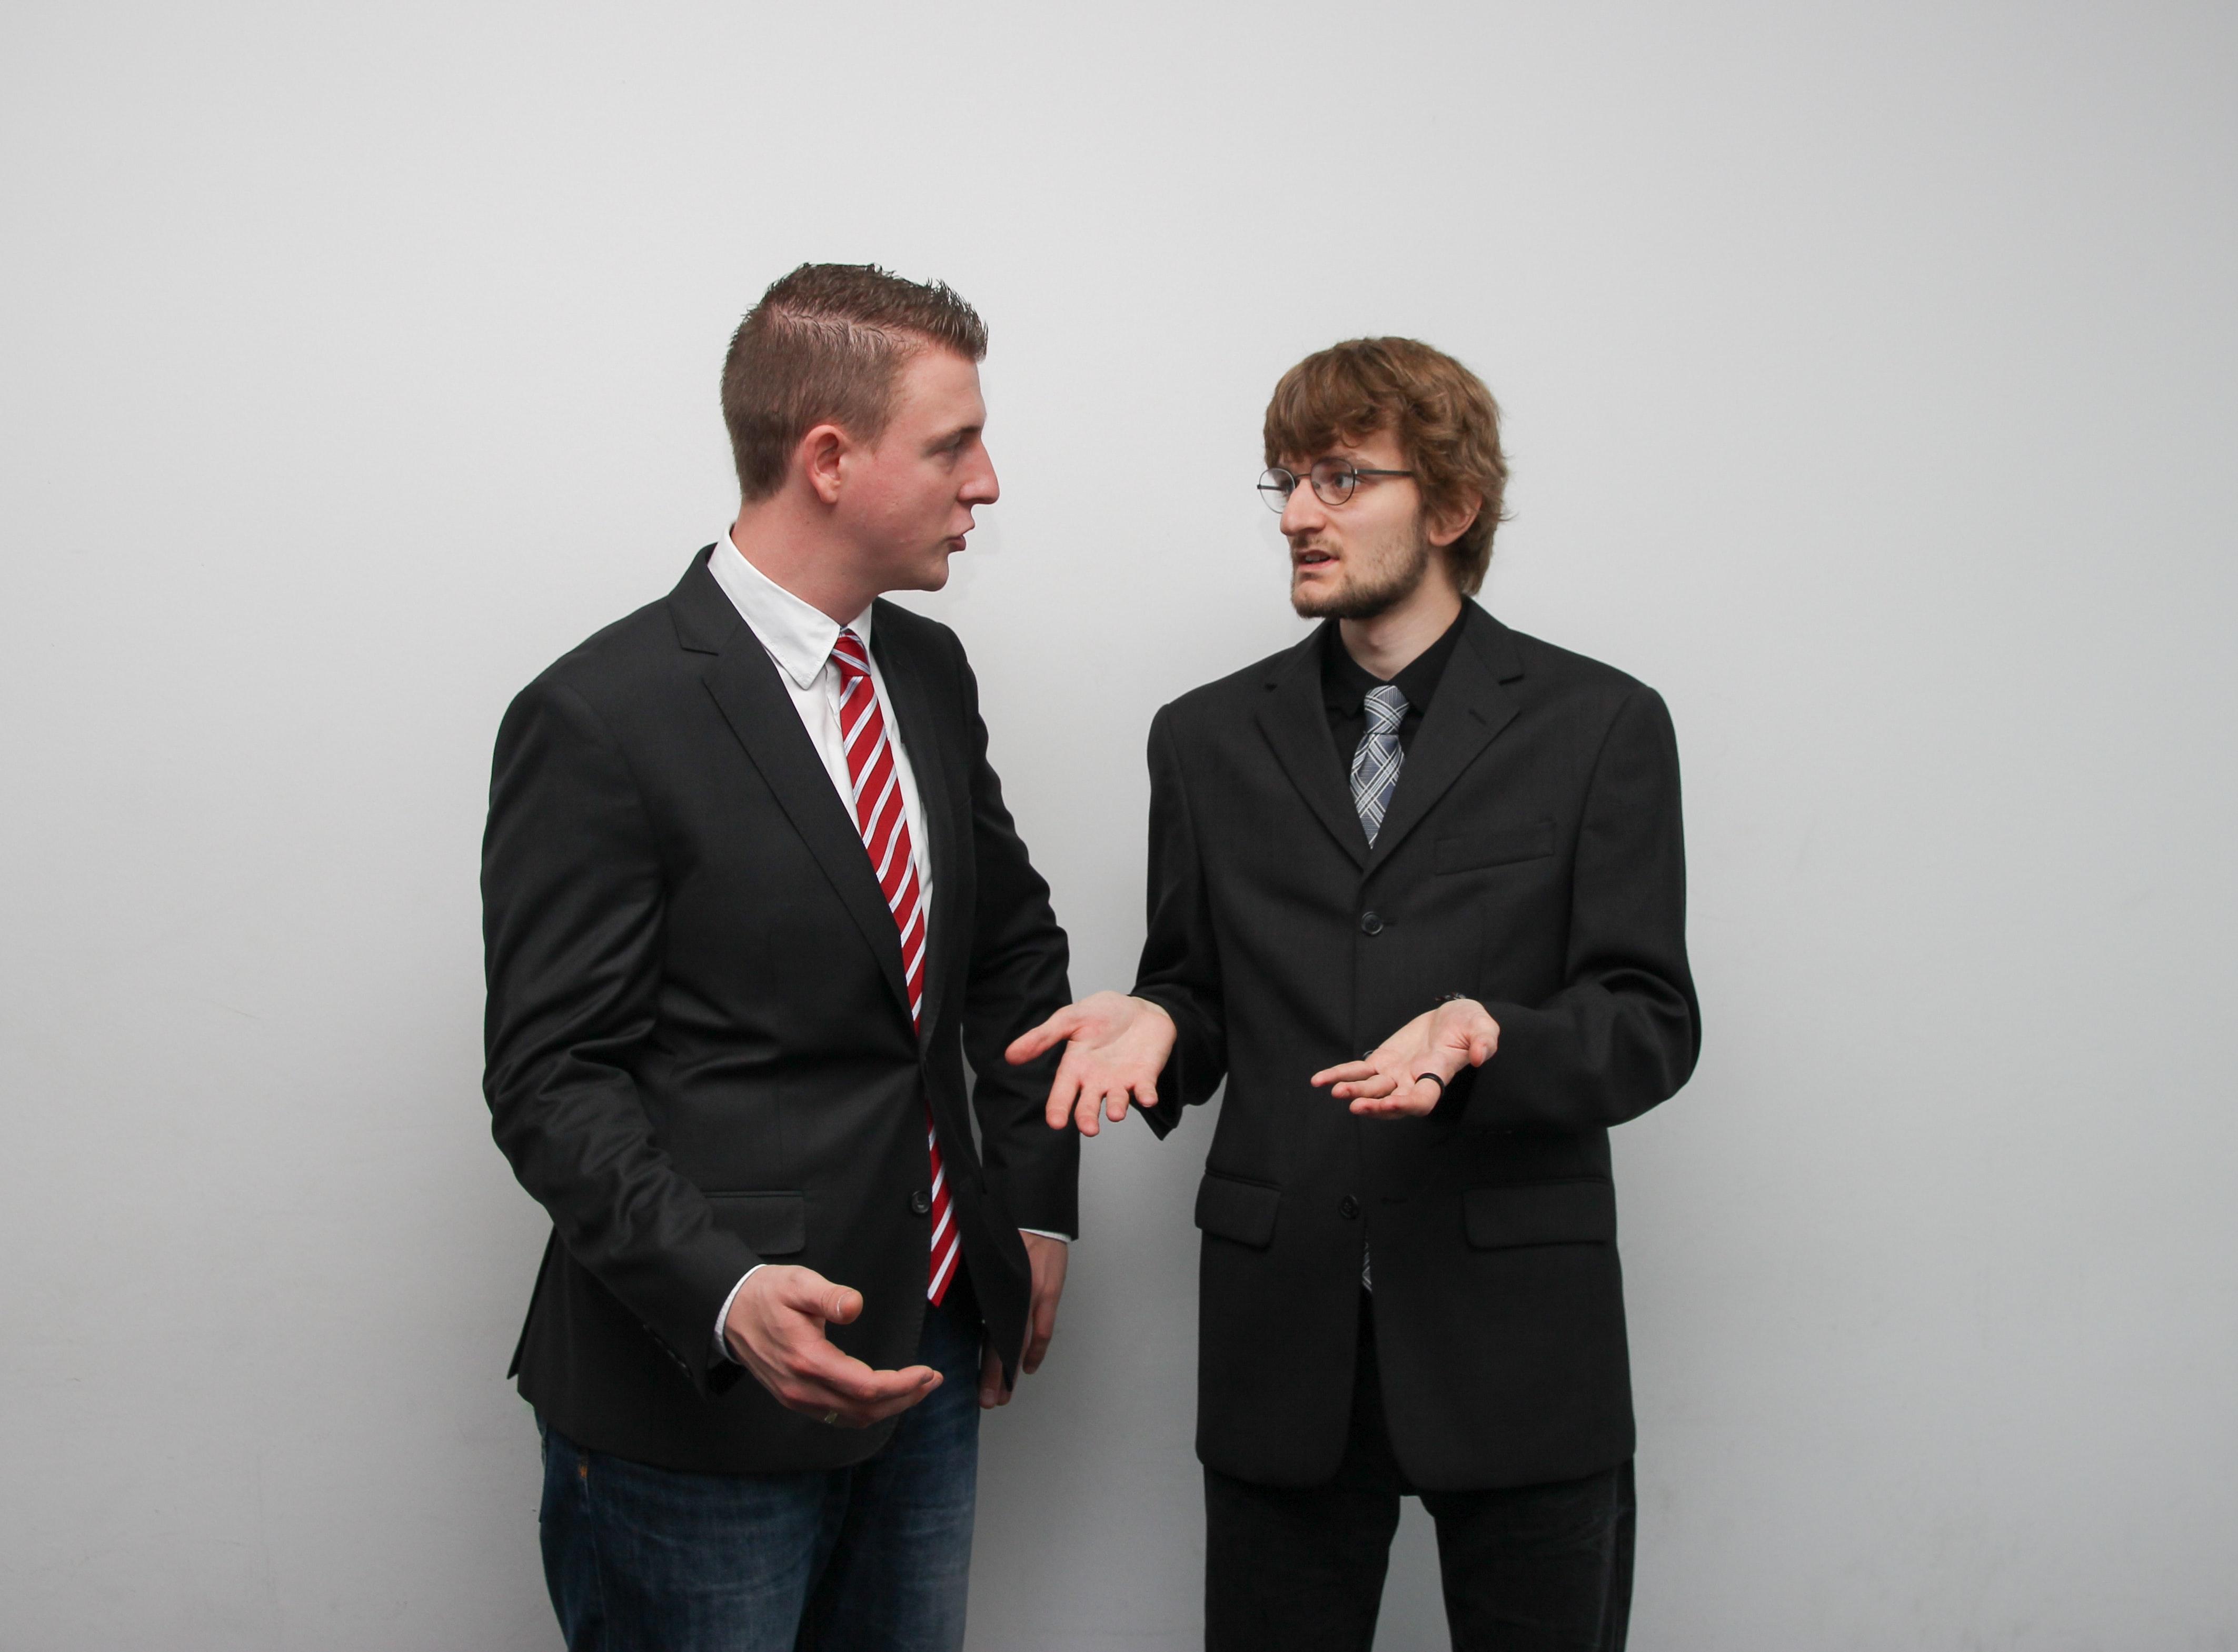 Two men arguing